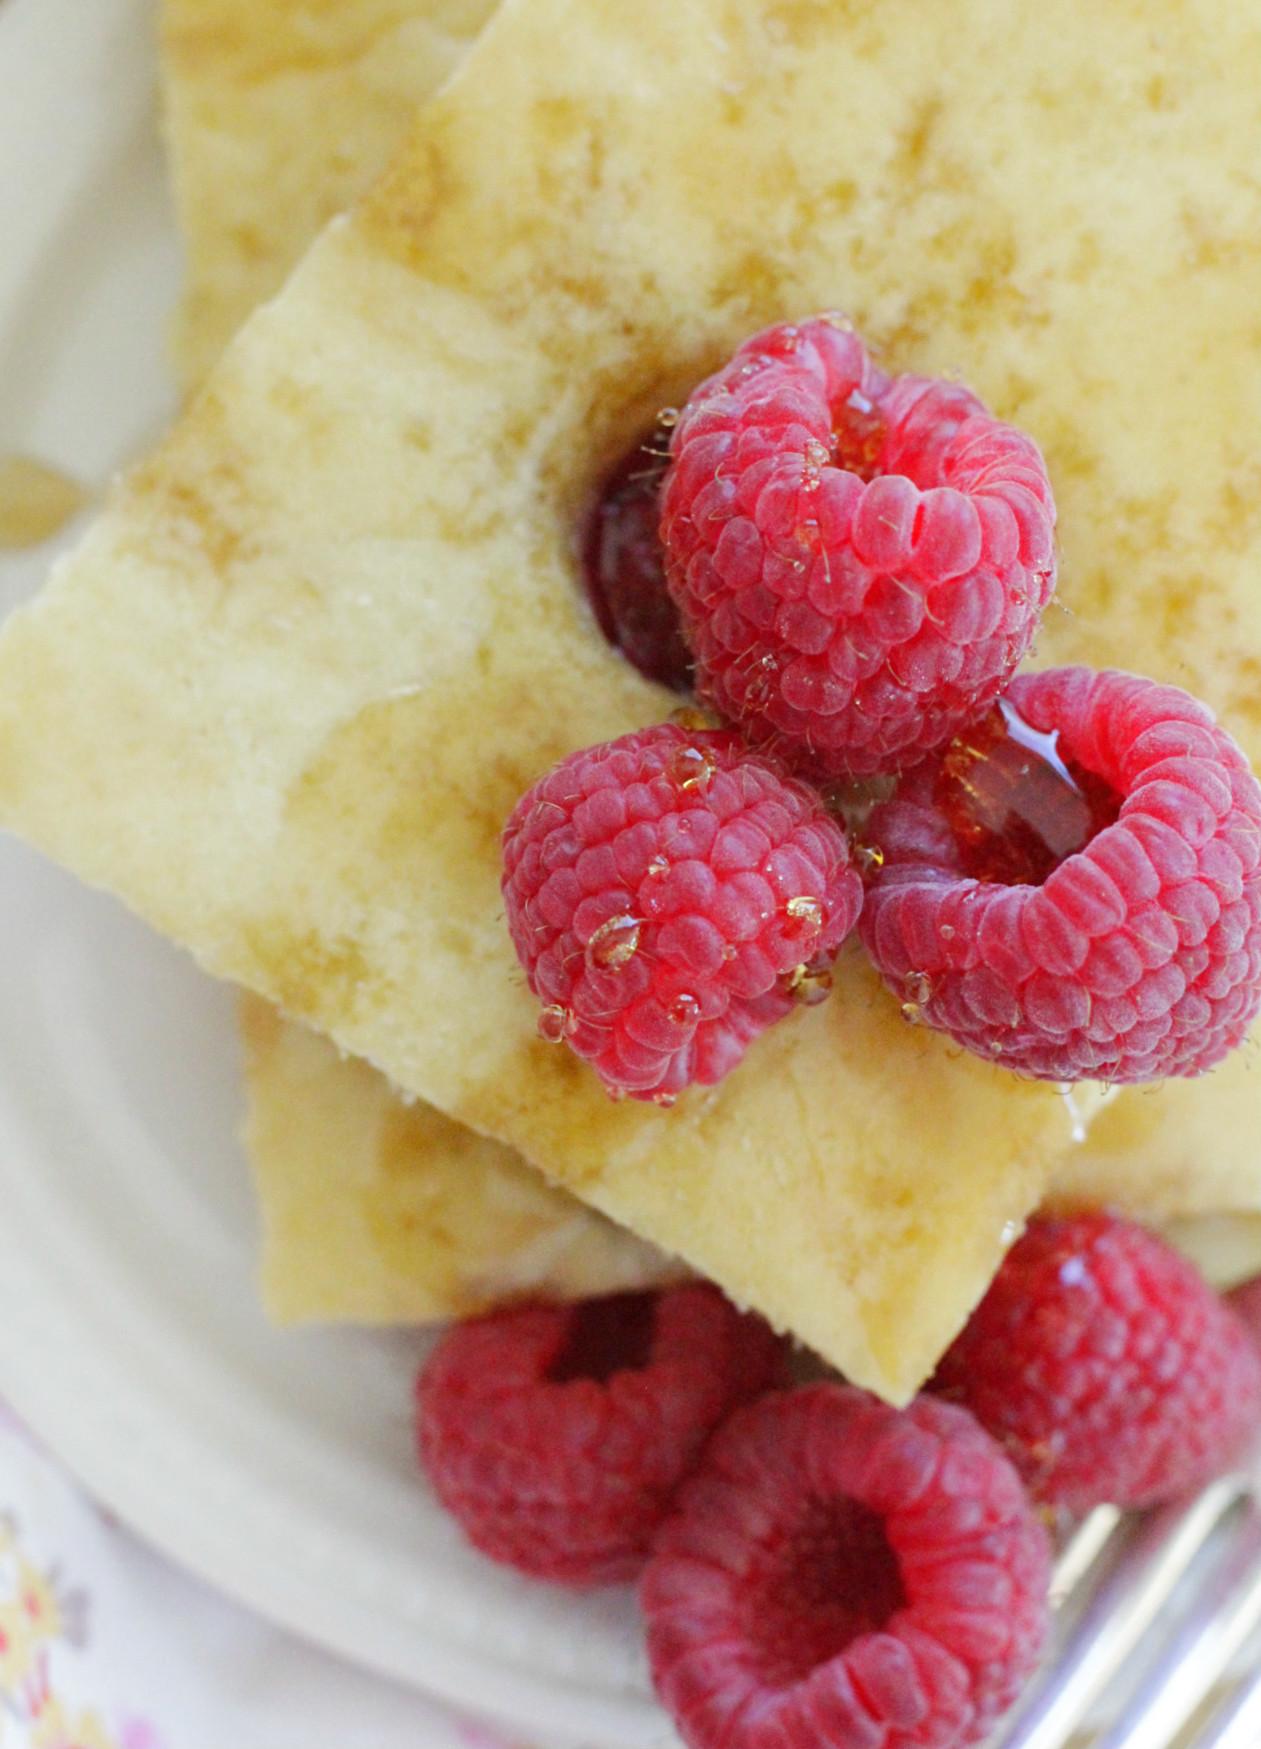 sheet pan pancakes and raspberries close up